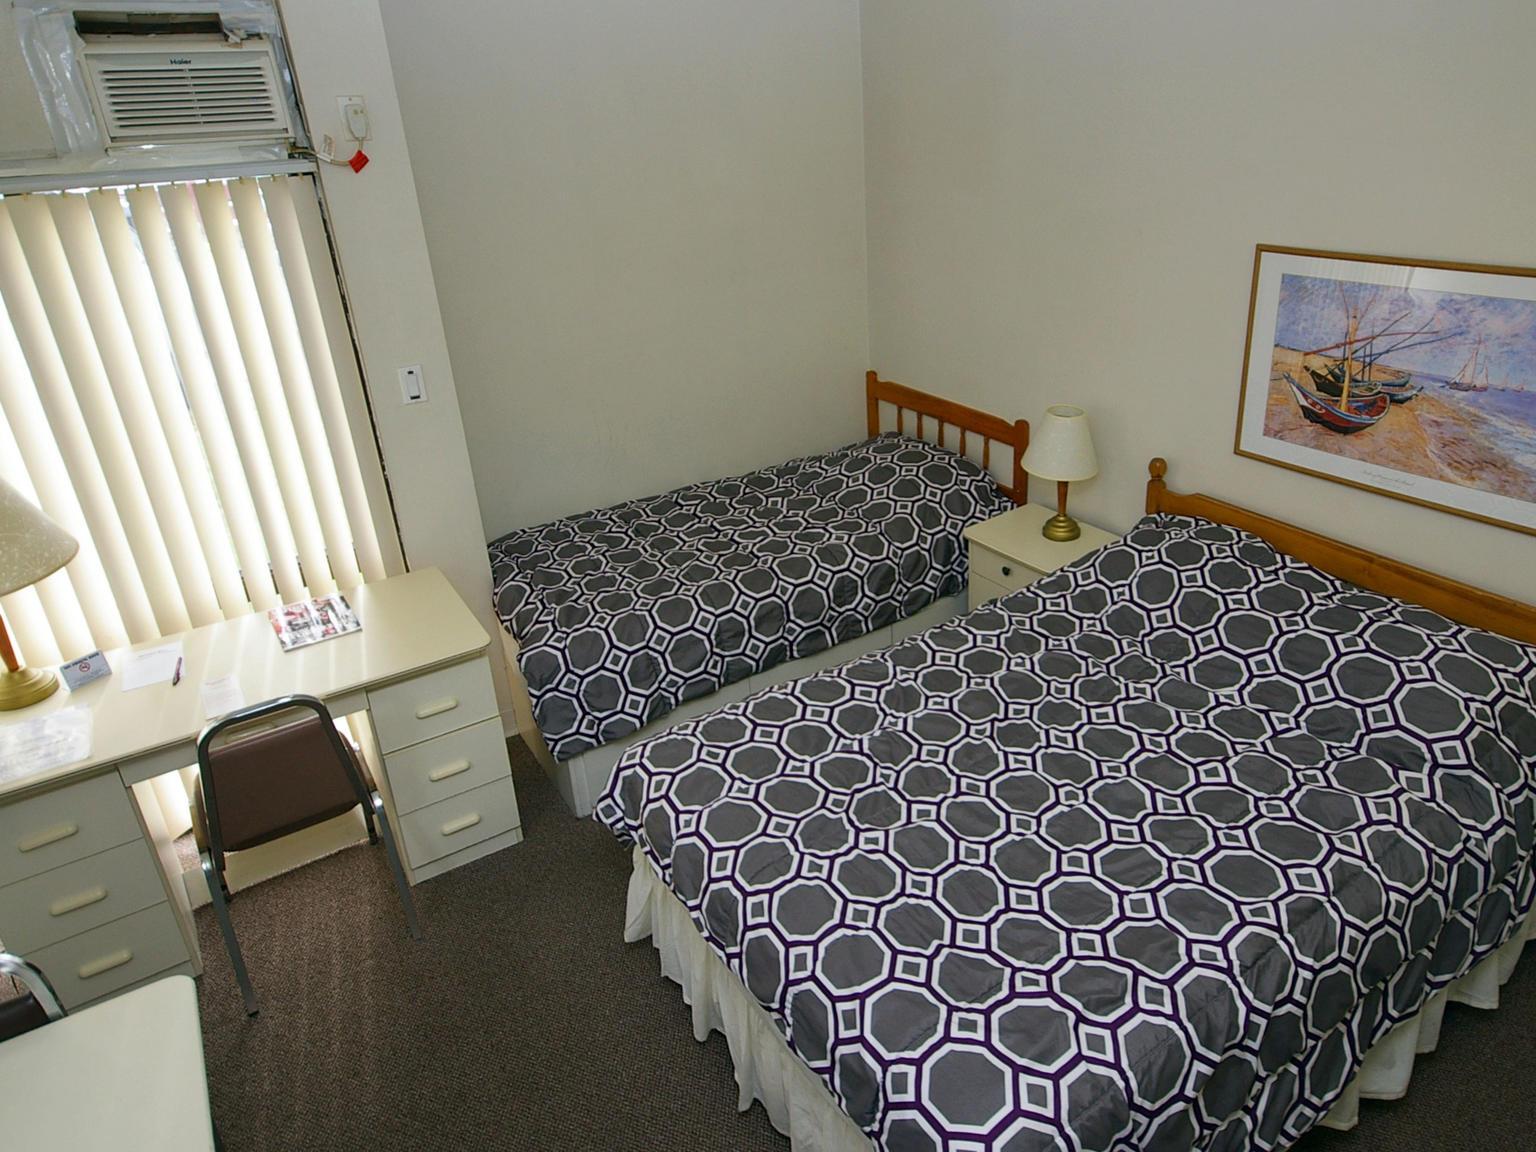 toronto_acc_alexandra-hotel_bedroom_01